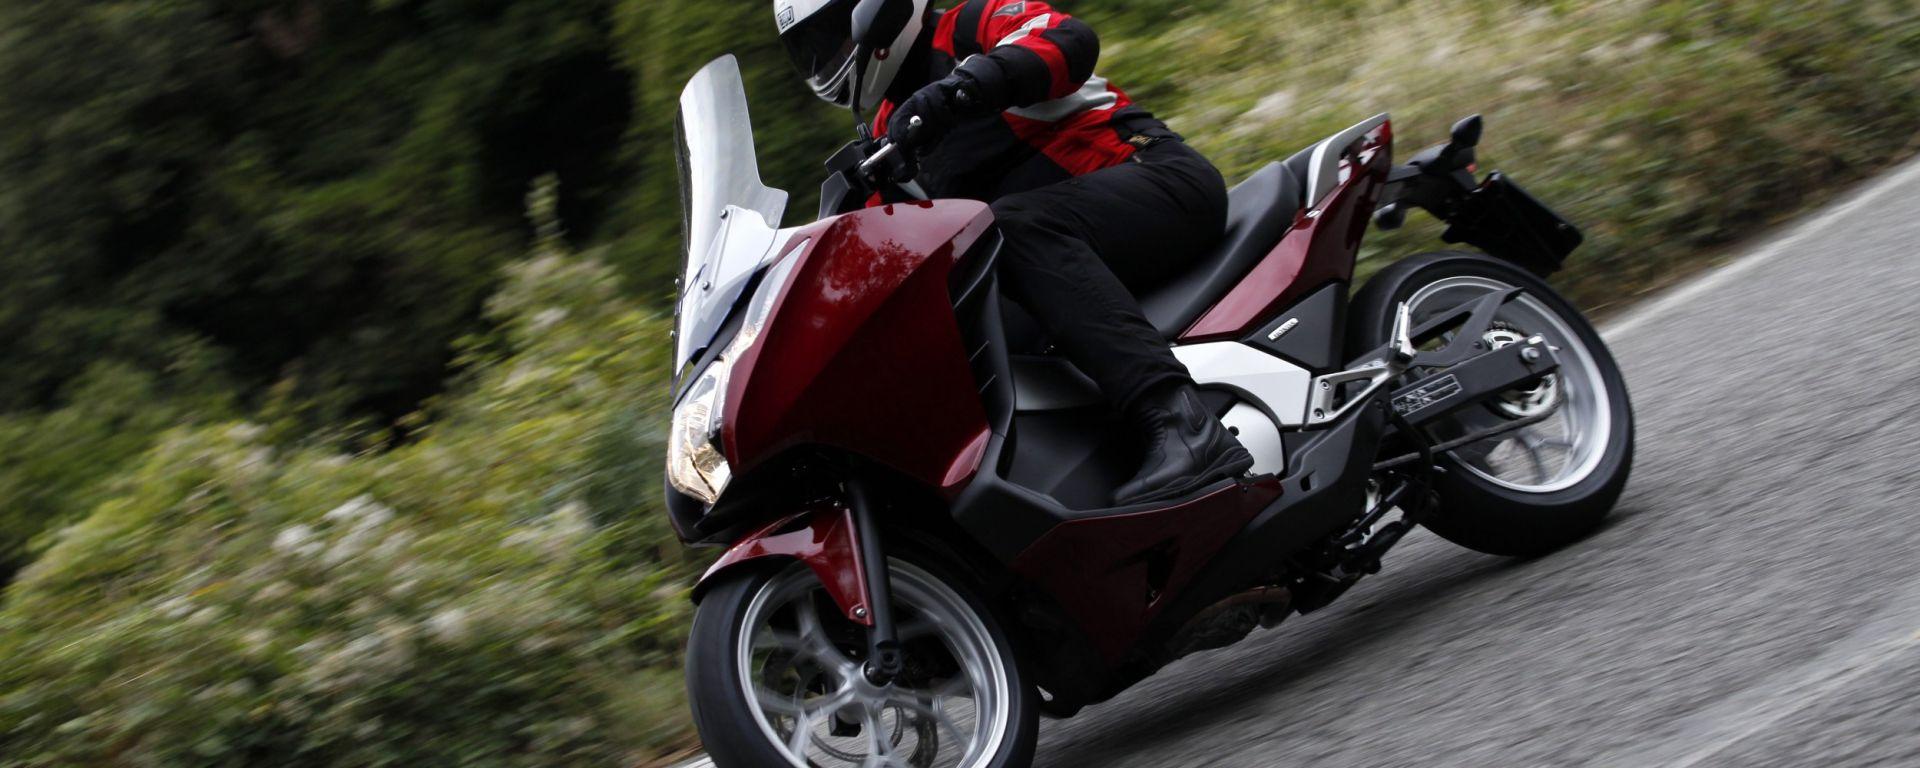 Honda Integra: la prova in video